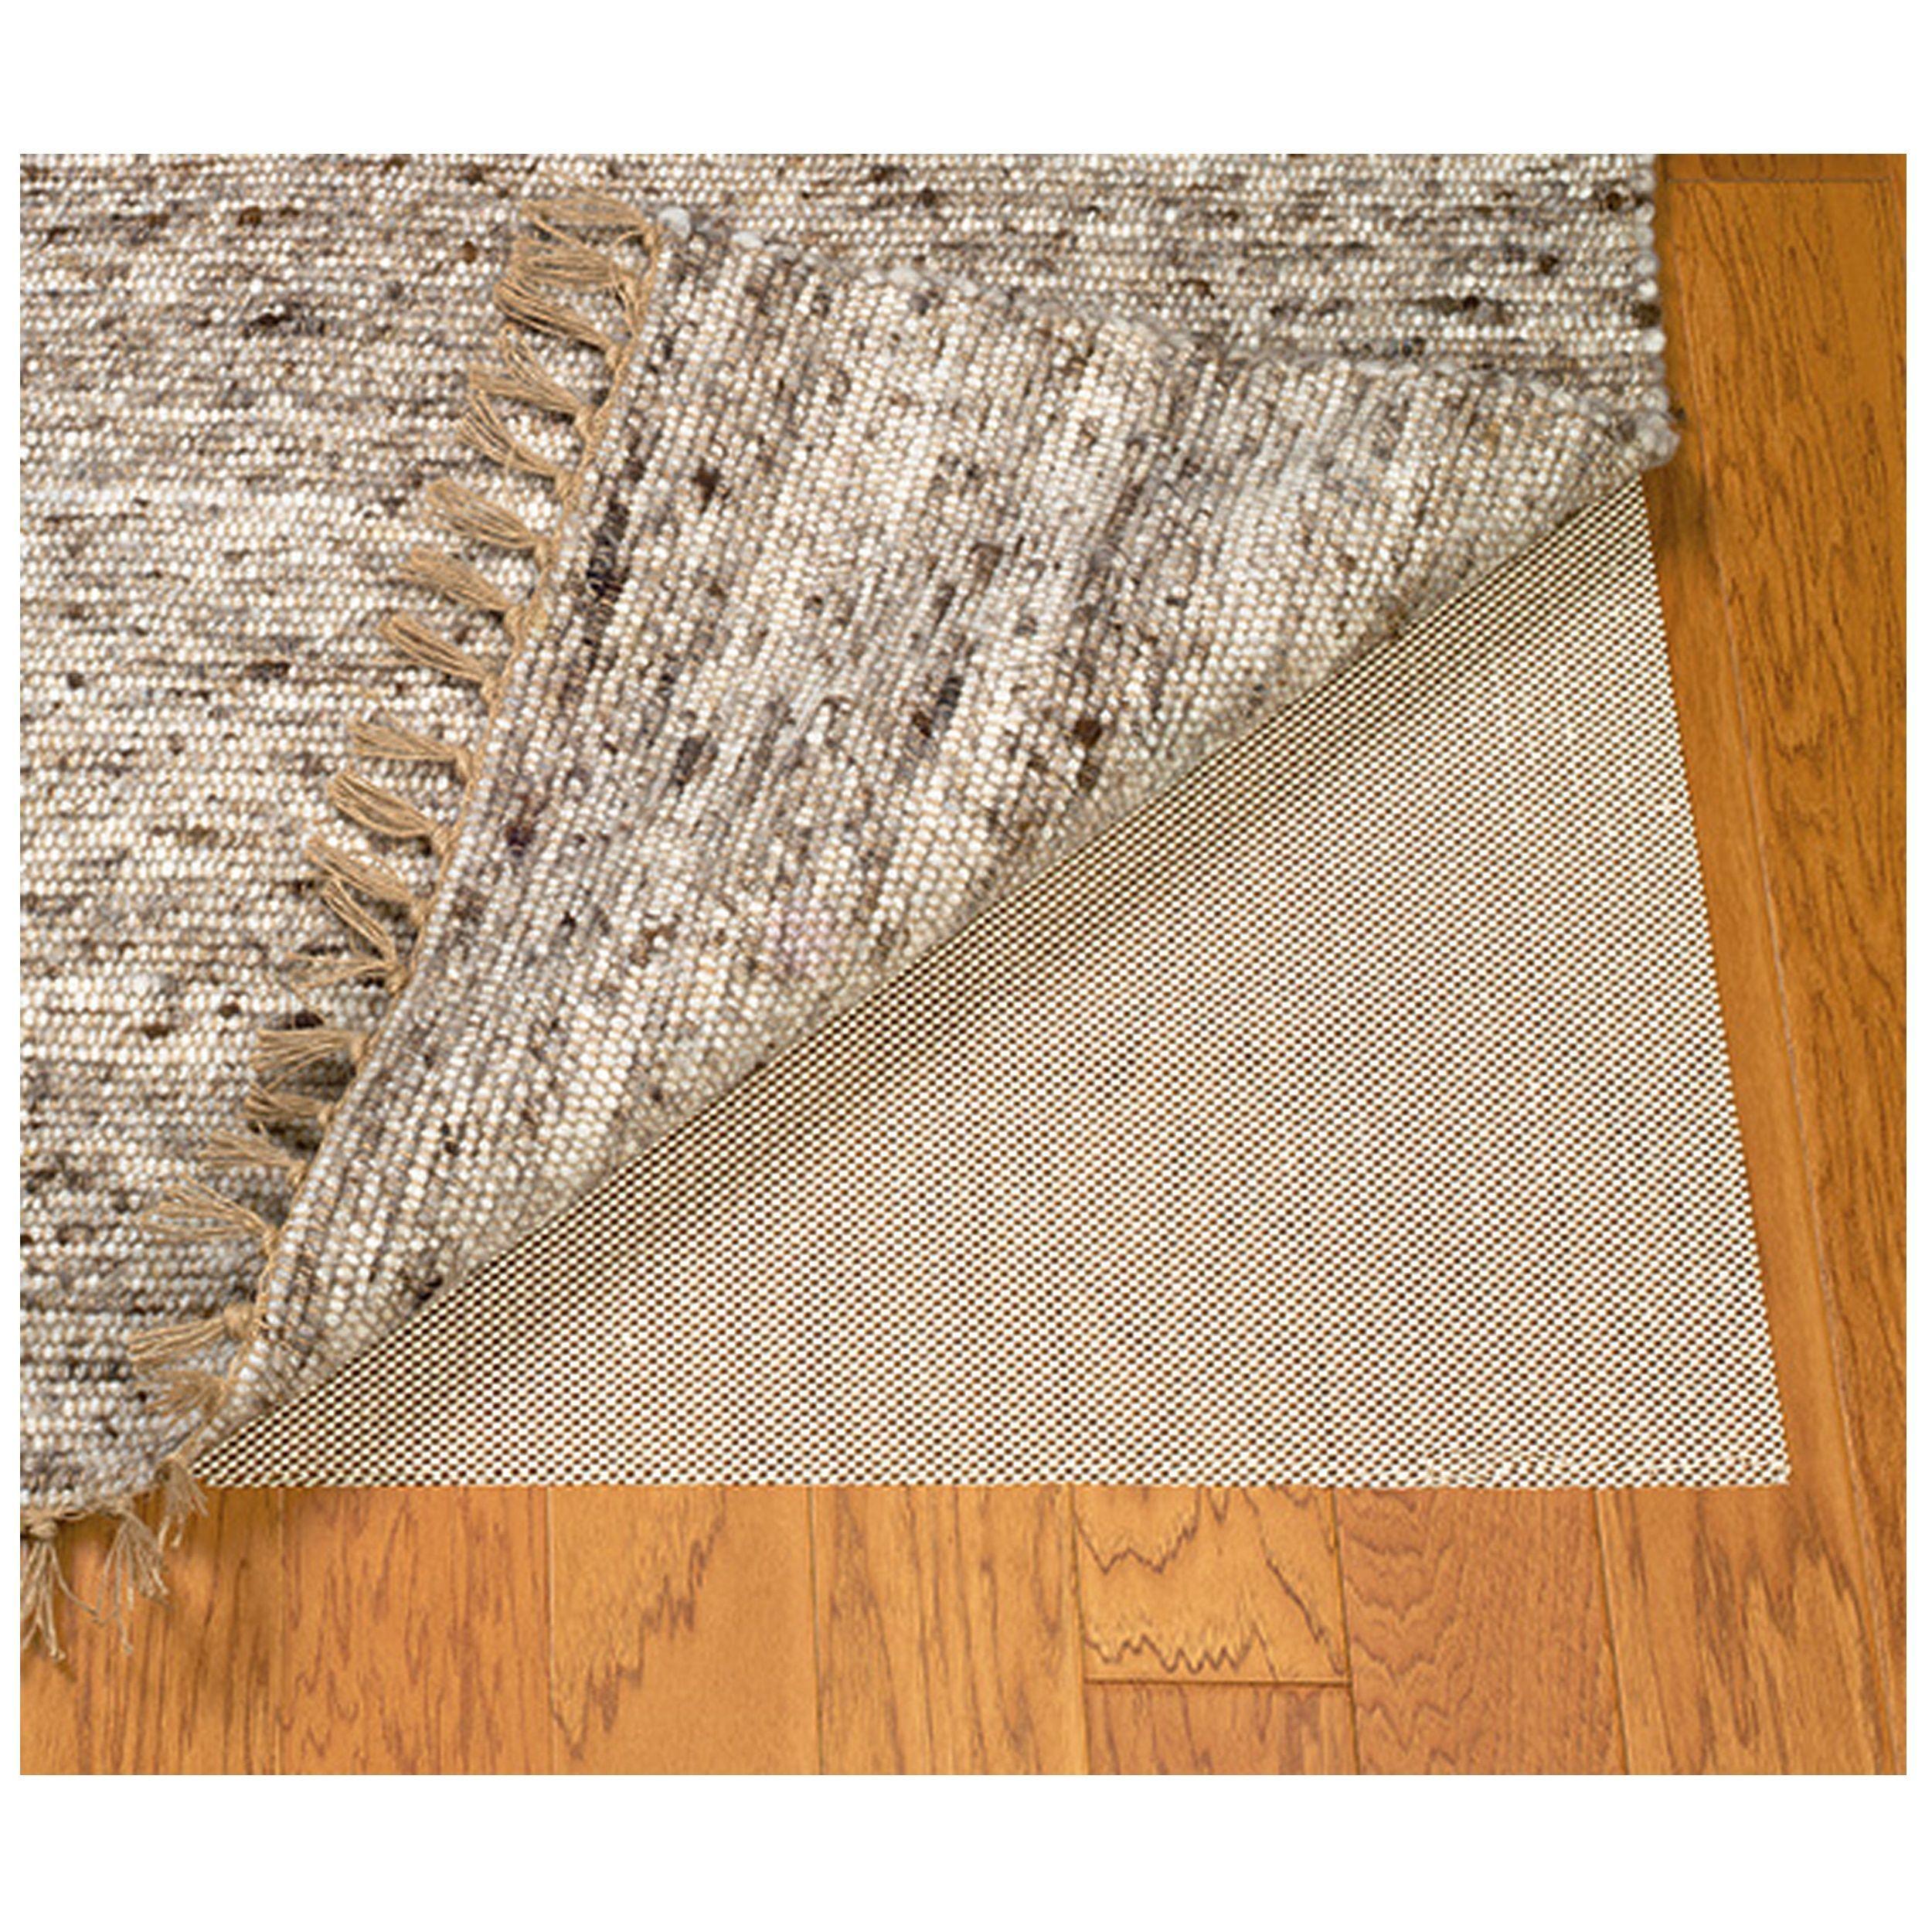 Linon rug pad ultra grip natural area rug underlay u x